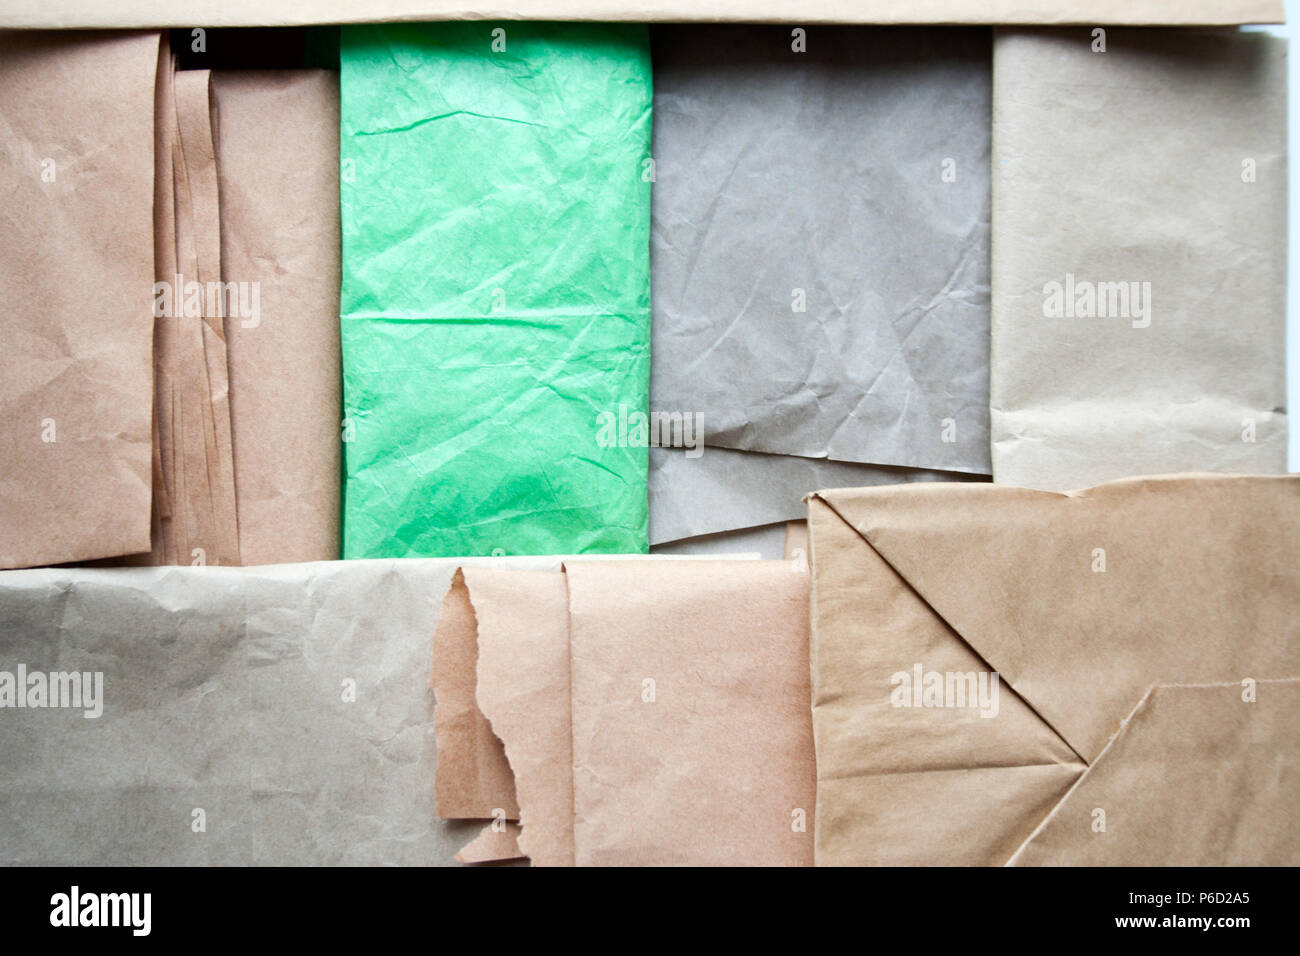 Packing Supplies Imágenes De Stock & Packing Supplies Fotos De Stock ...